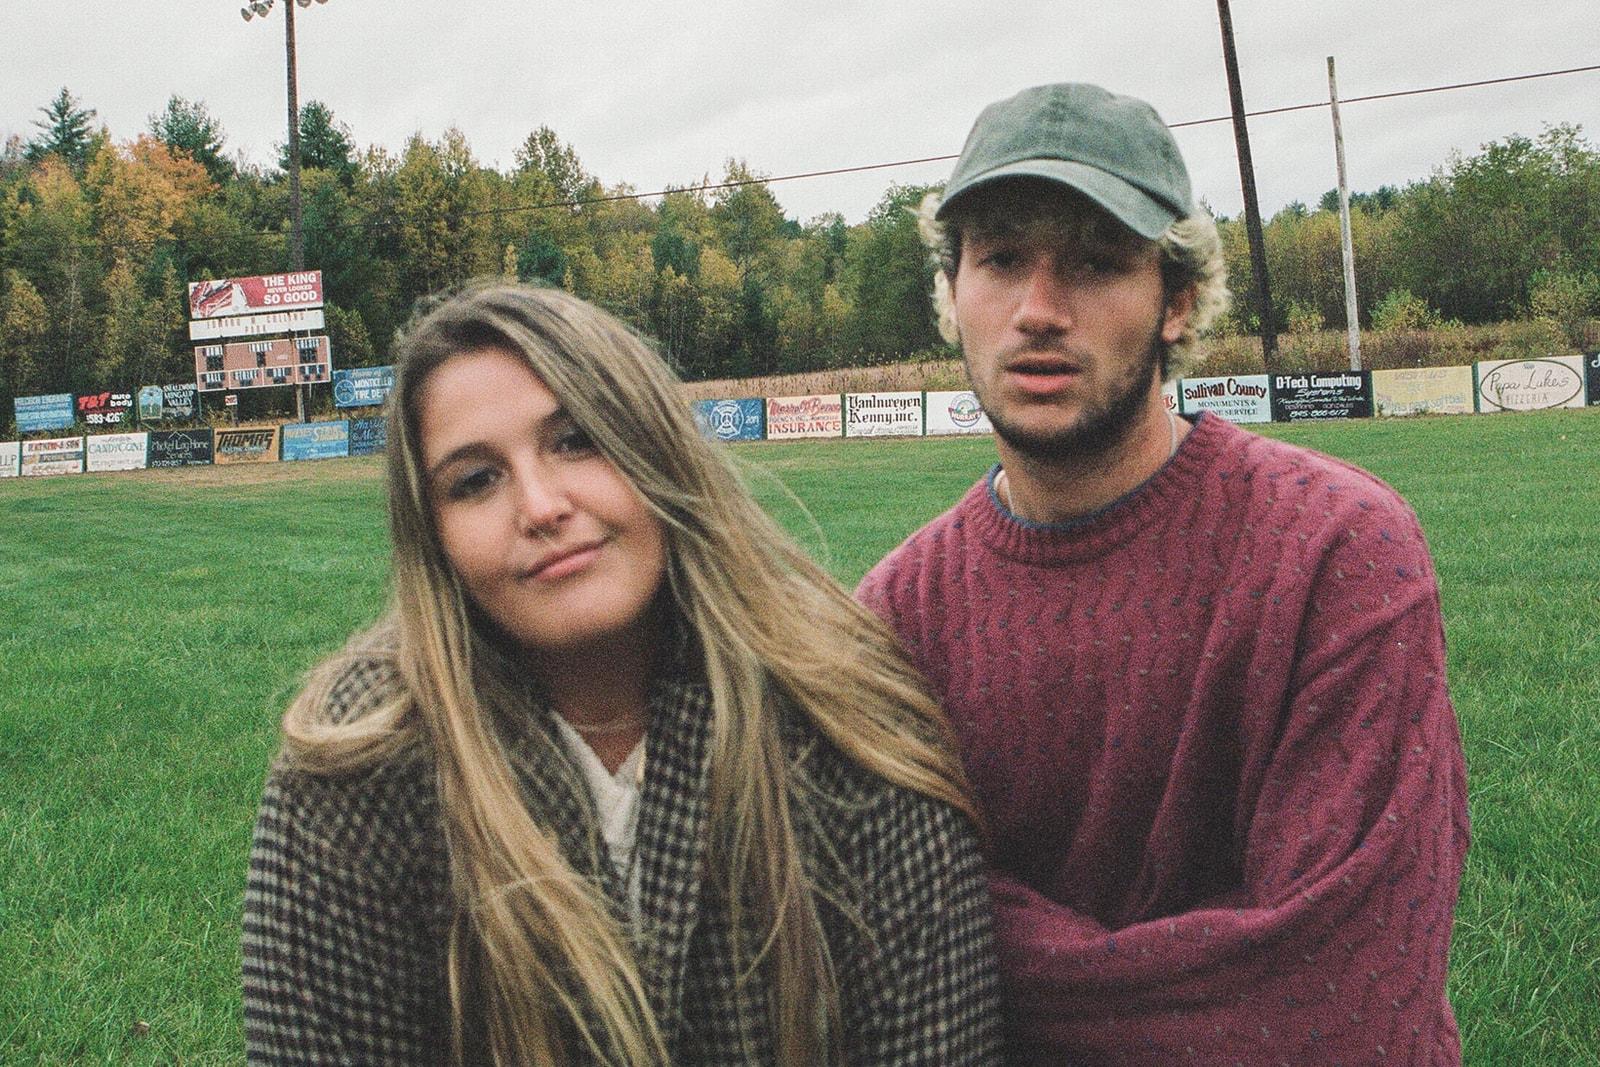 Jeremy Zucker Chelsea Cutler brent ii EP Artists Musicians Singers Performers